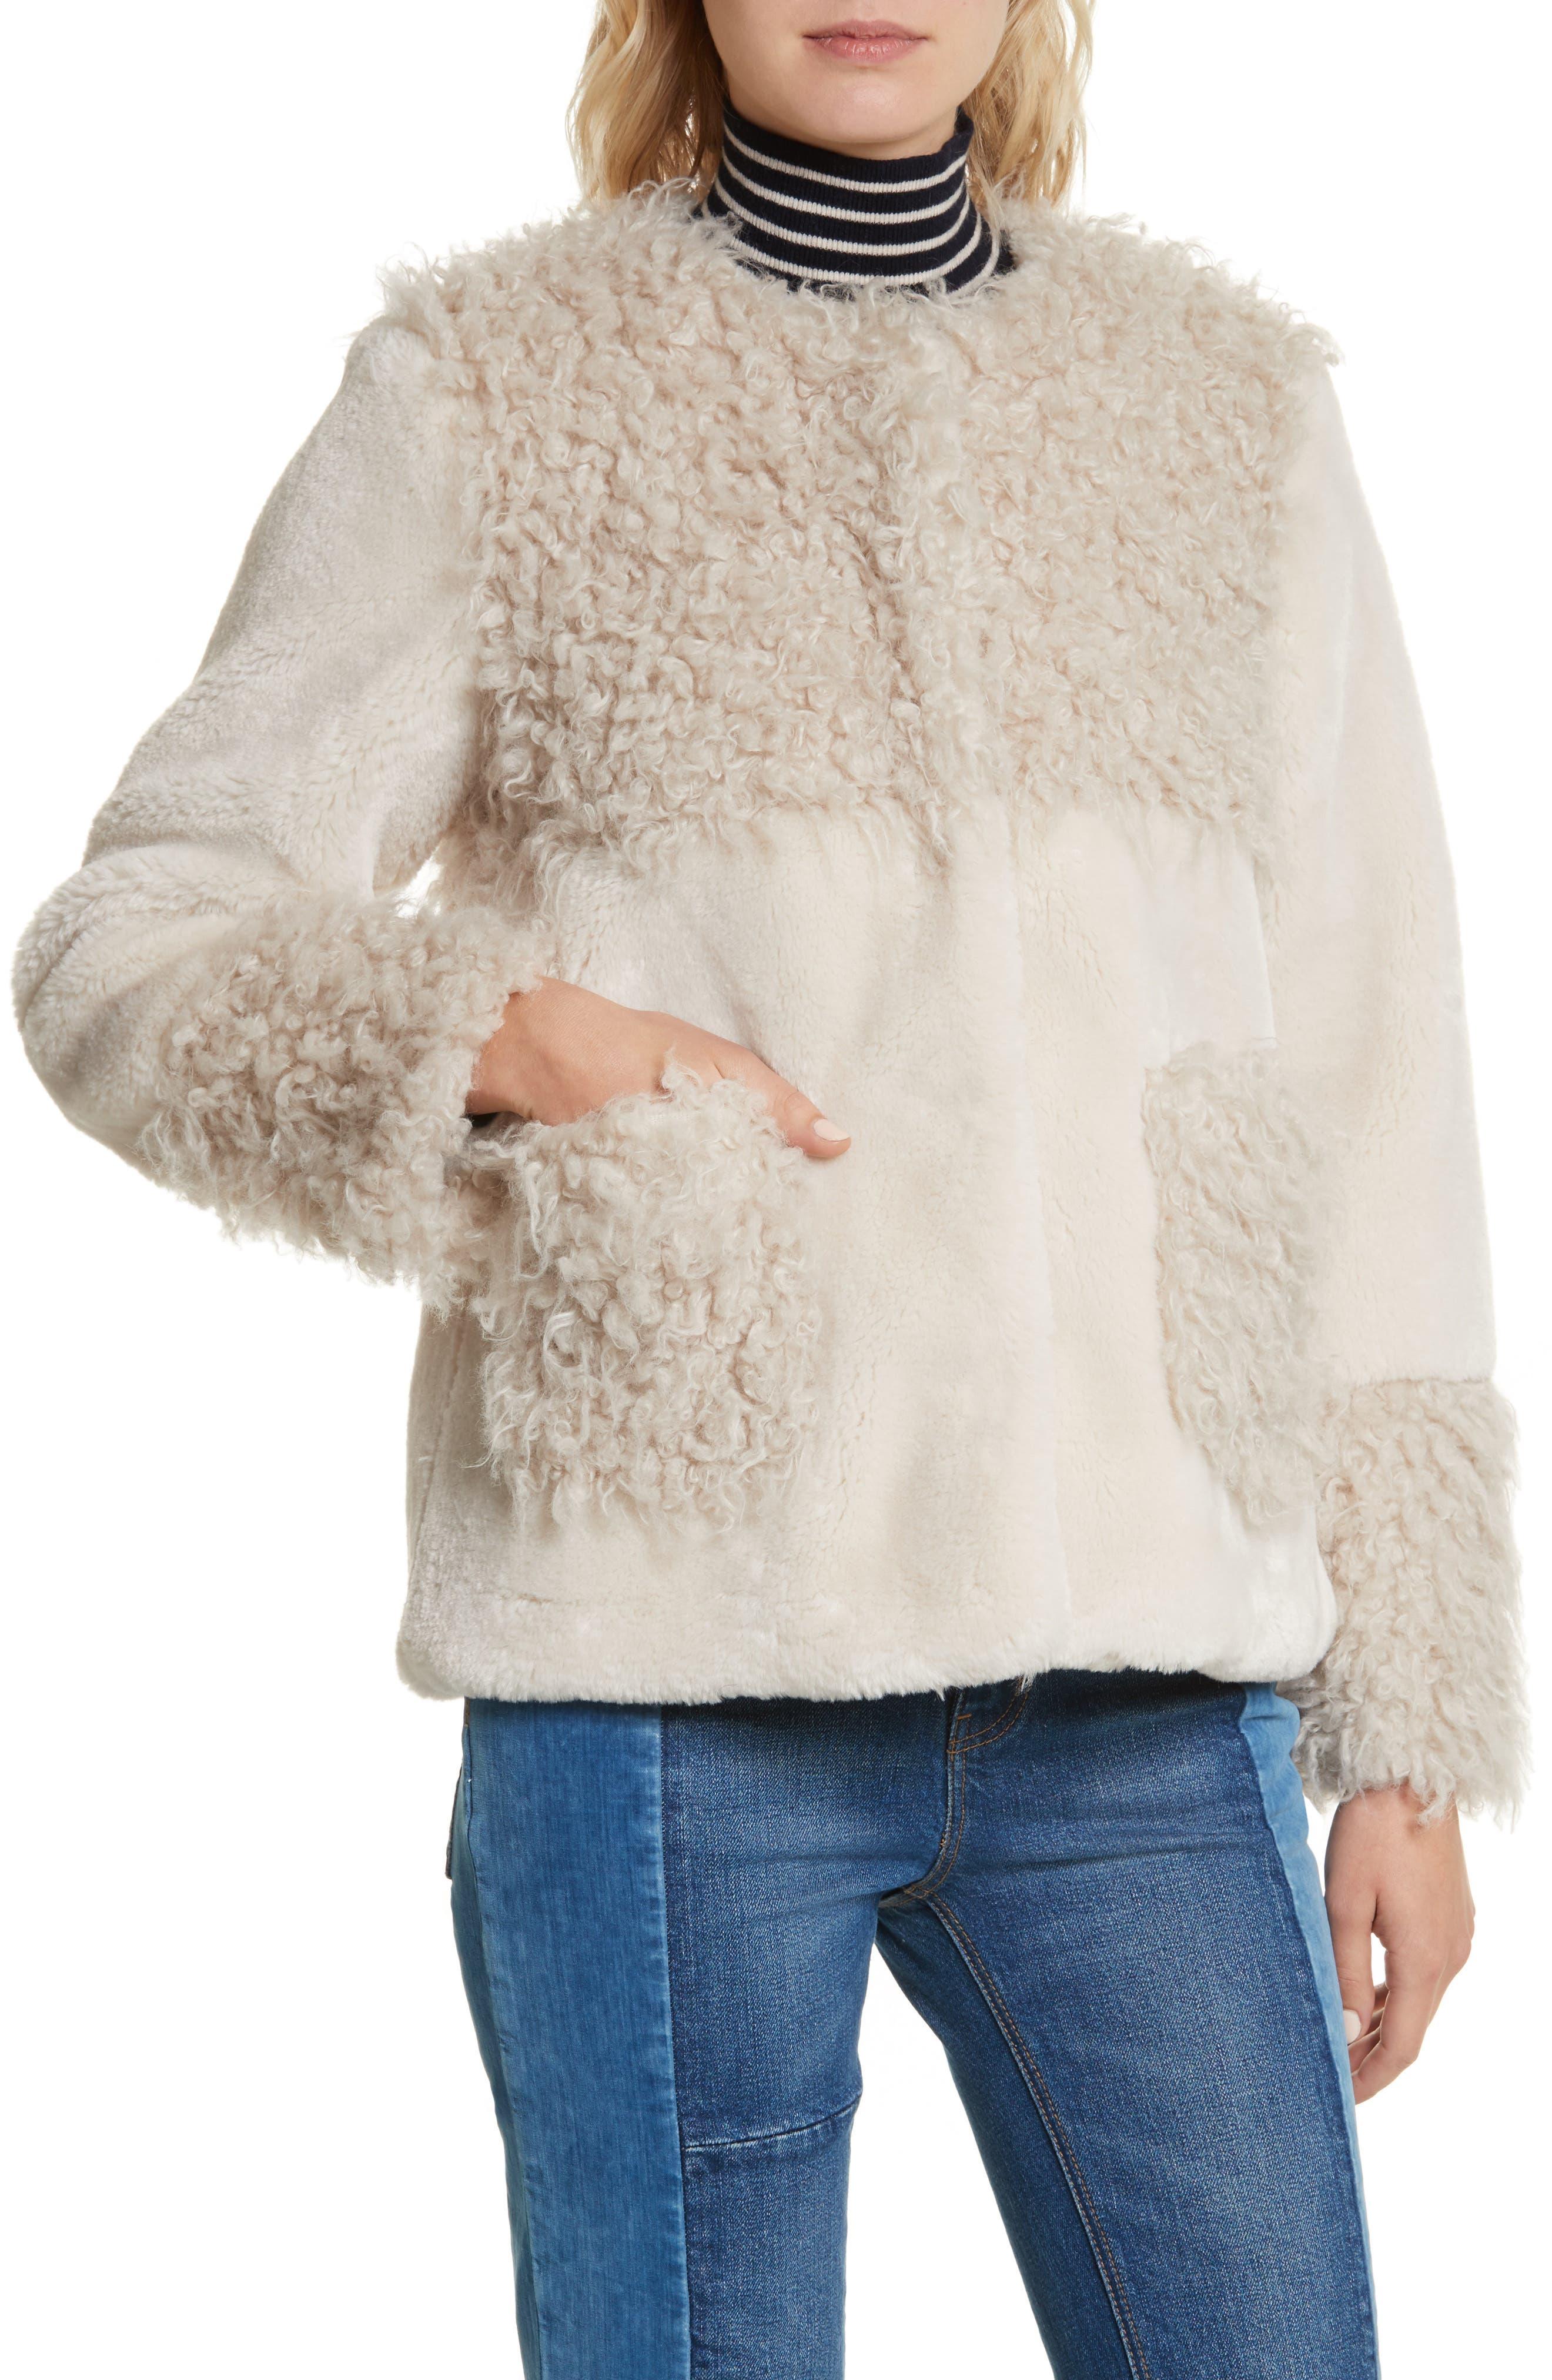 Mixed Faux Fur Coat,                             Alternate thumbnail 4, color,                             905